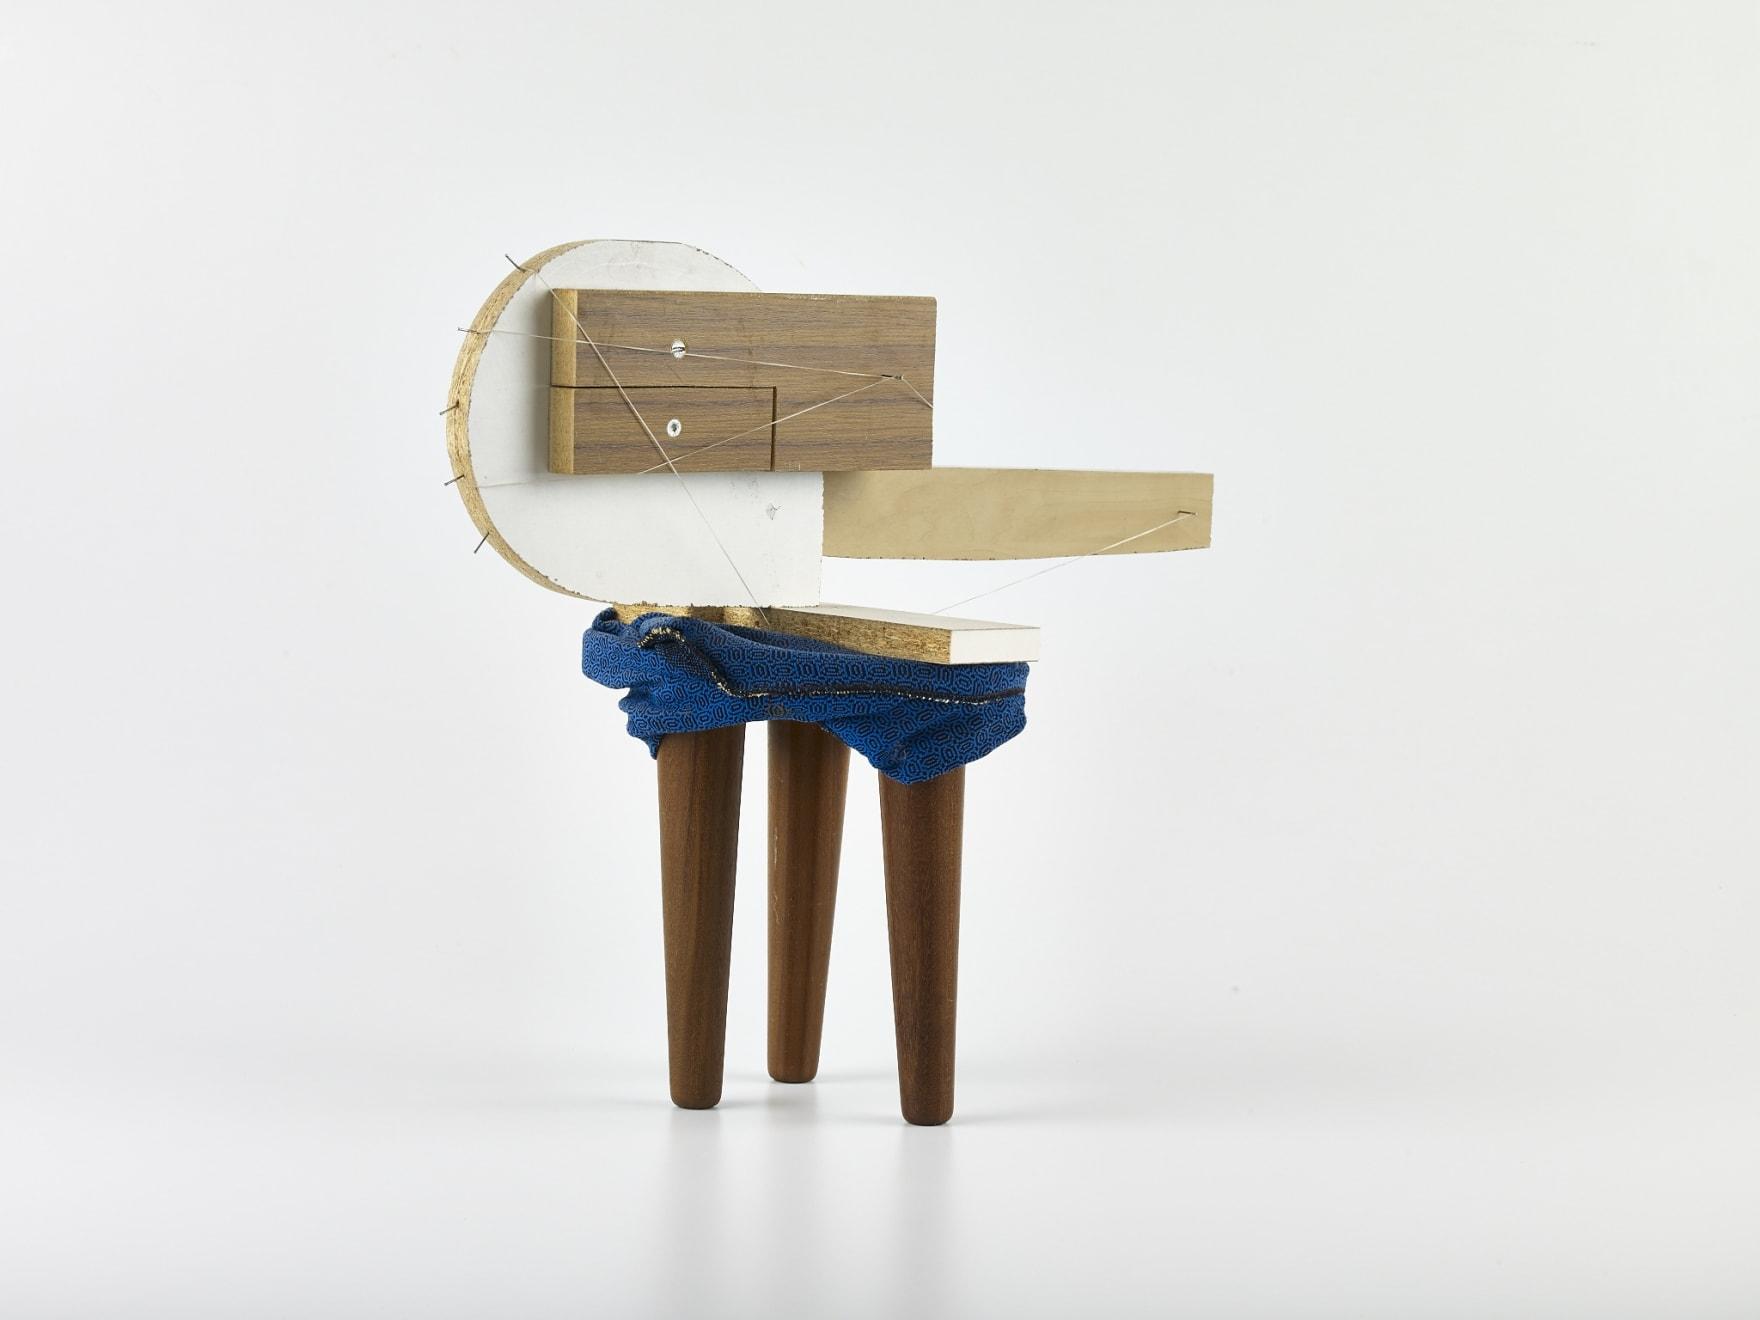 Eric Bainbridge, Untitled, 1997